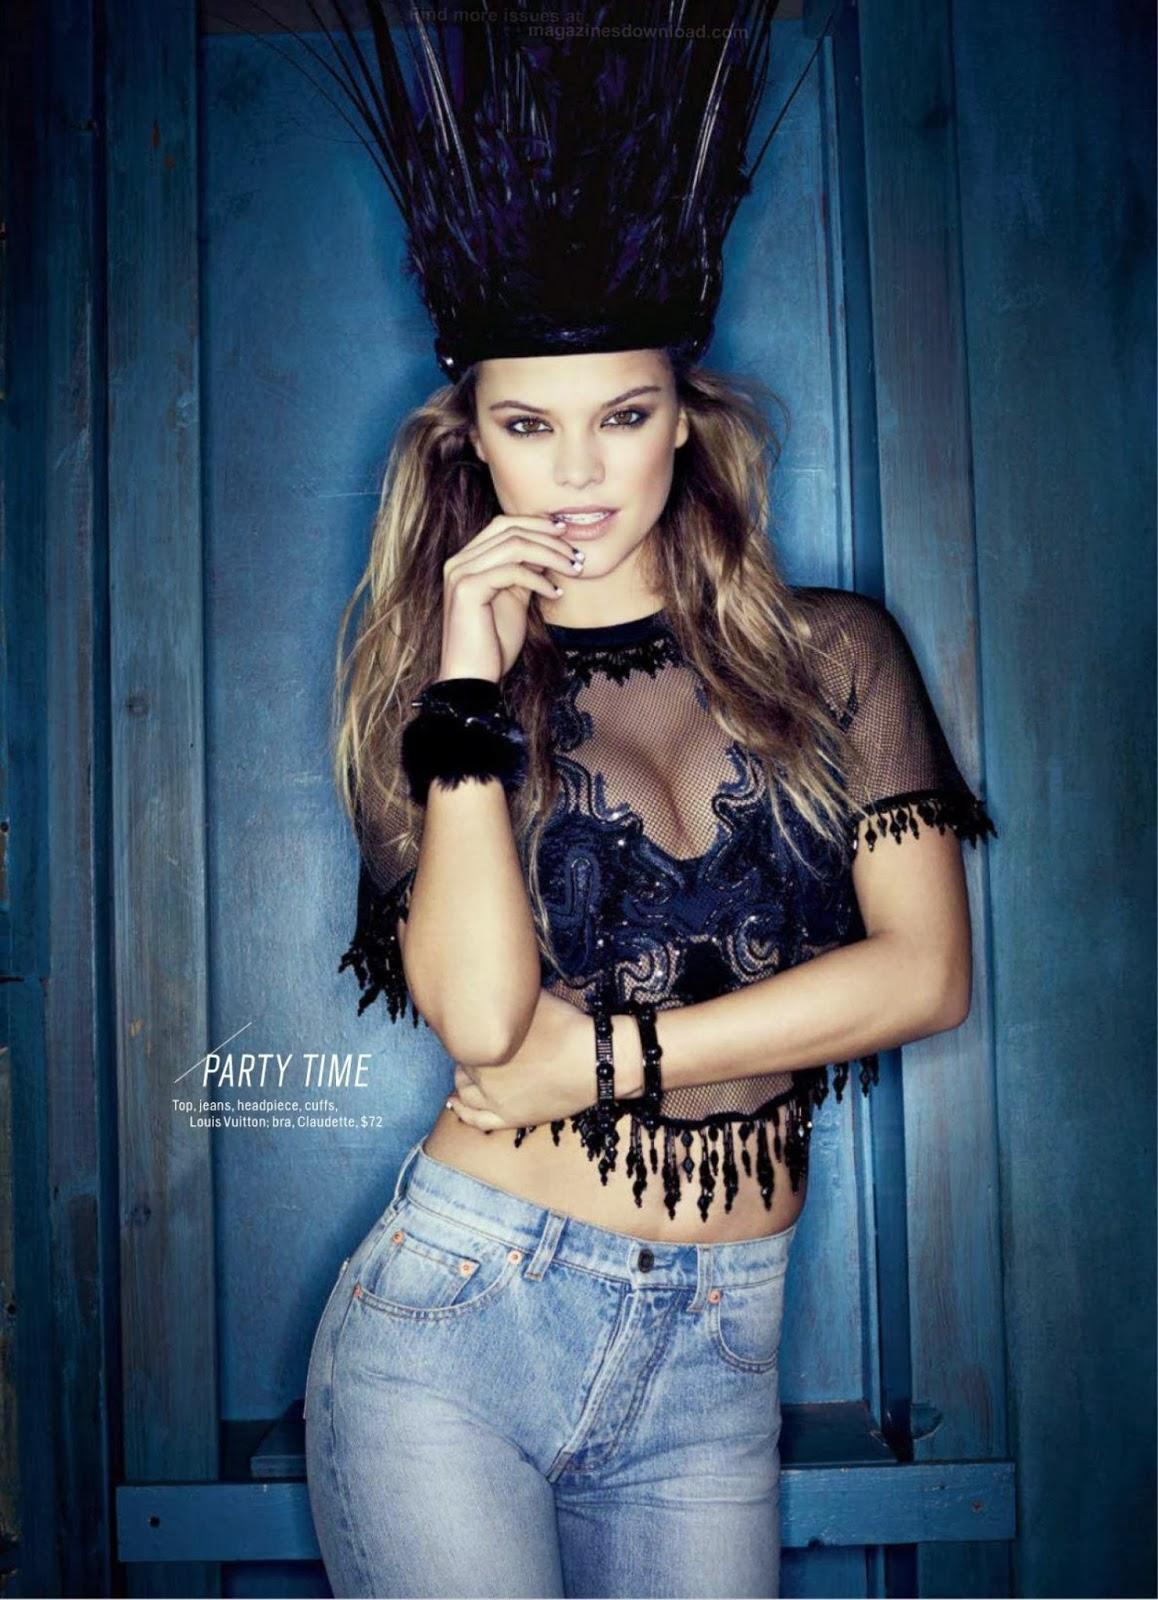 Nina Agdal HQ Pictures Cosmopolitan US Magazine Photoshoot April 2014